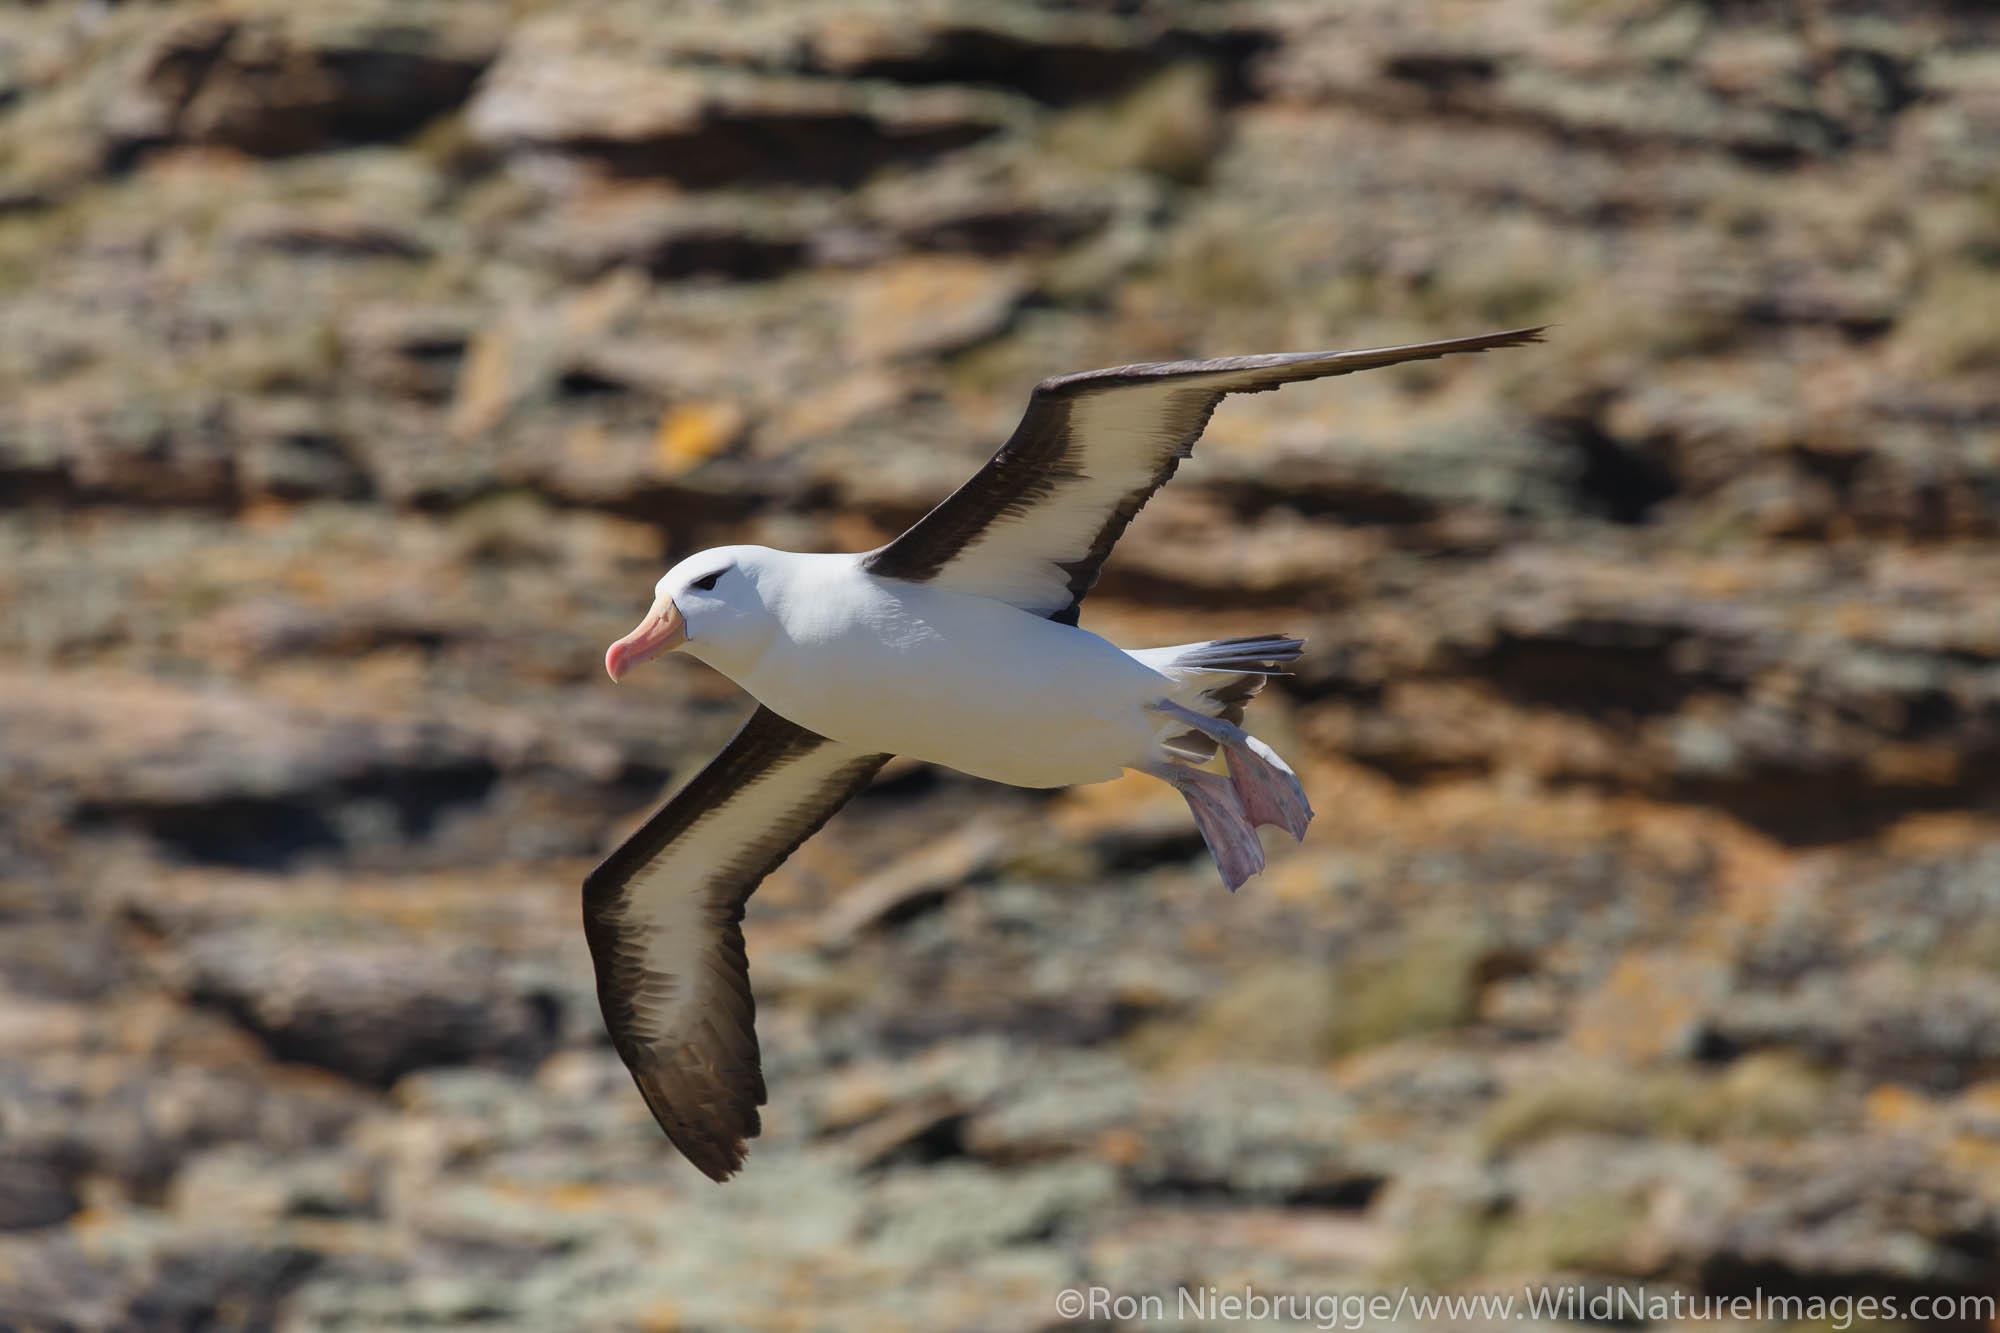 Falklands, Falkland islands, photos, bird, photo